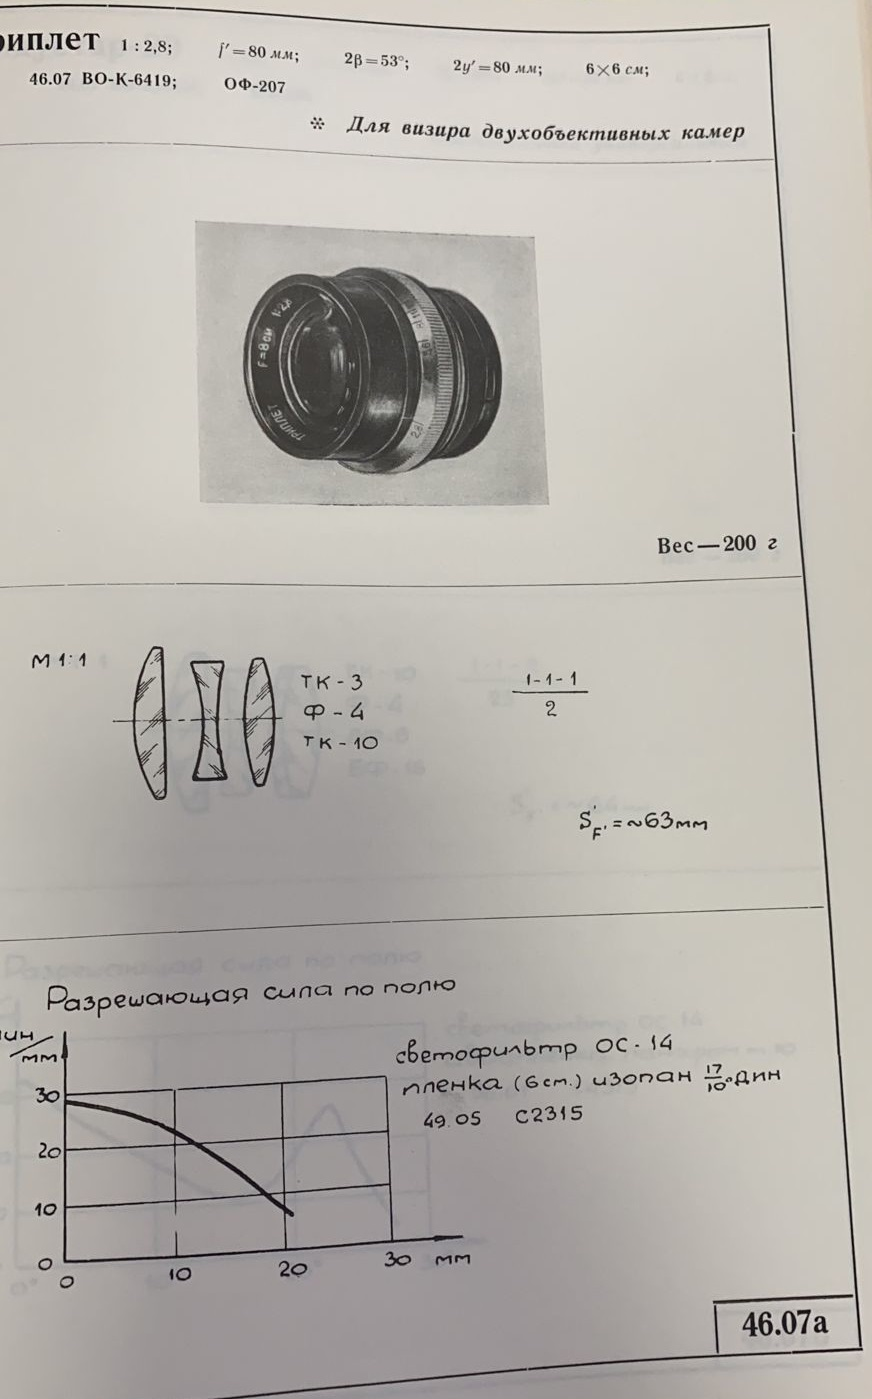 Карточка объектива Триплет 80/2.8 в каталоге ГОИ и его технические характеристики.